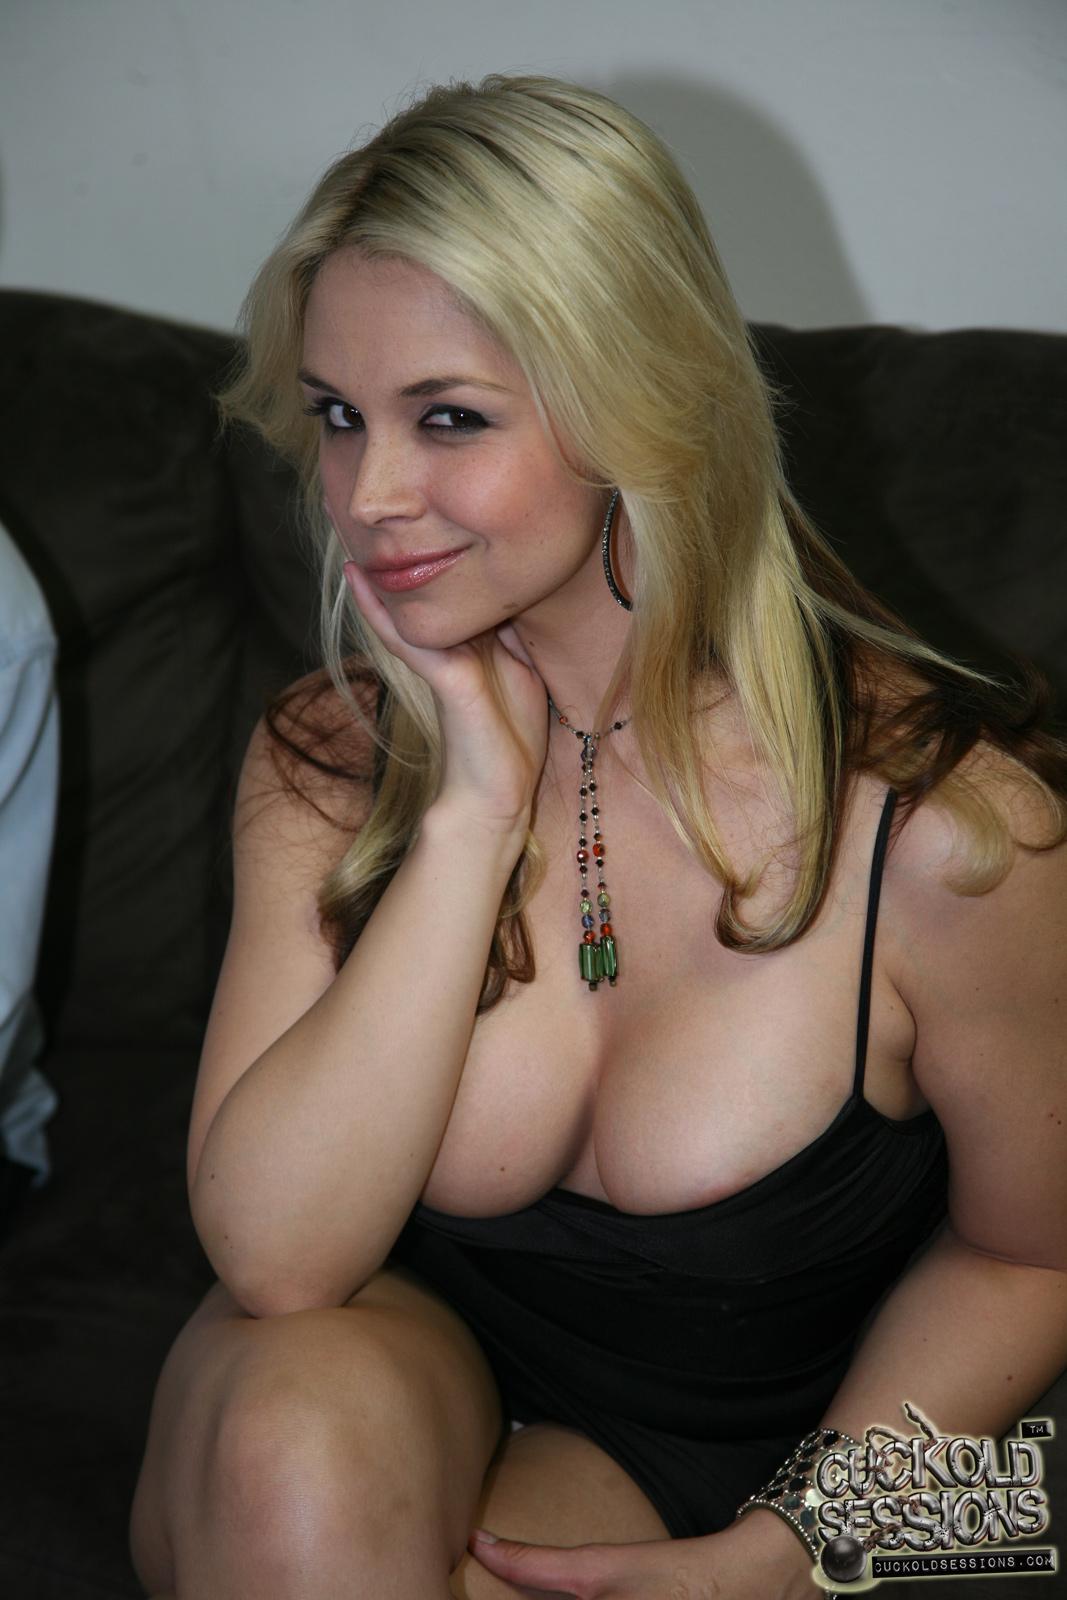 Sarah Vandella Porn Photos Photo Free Sex Photos Pics